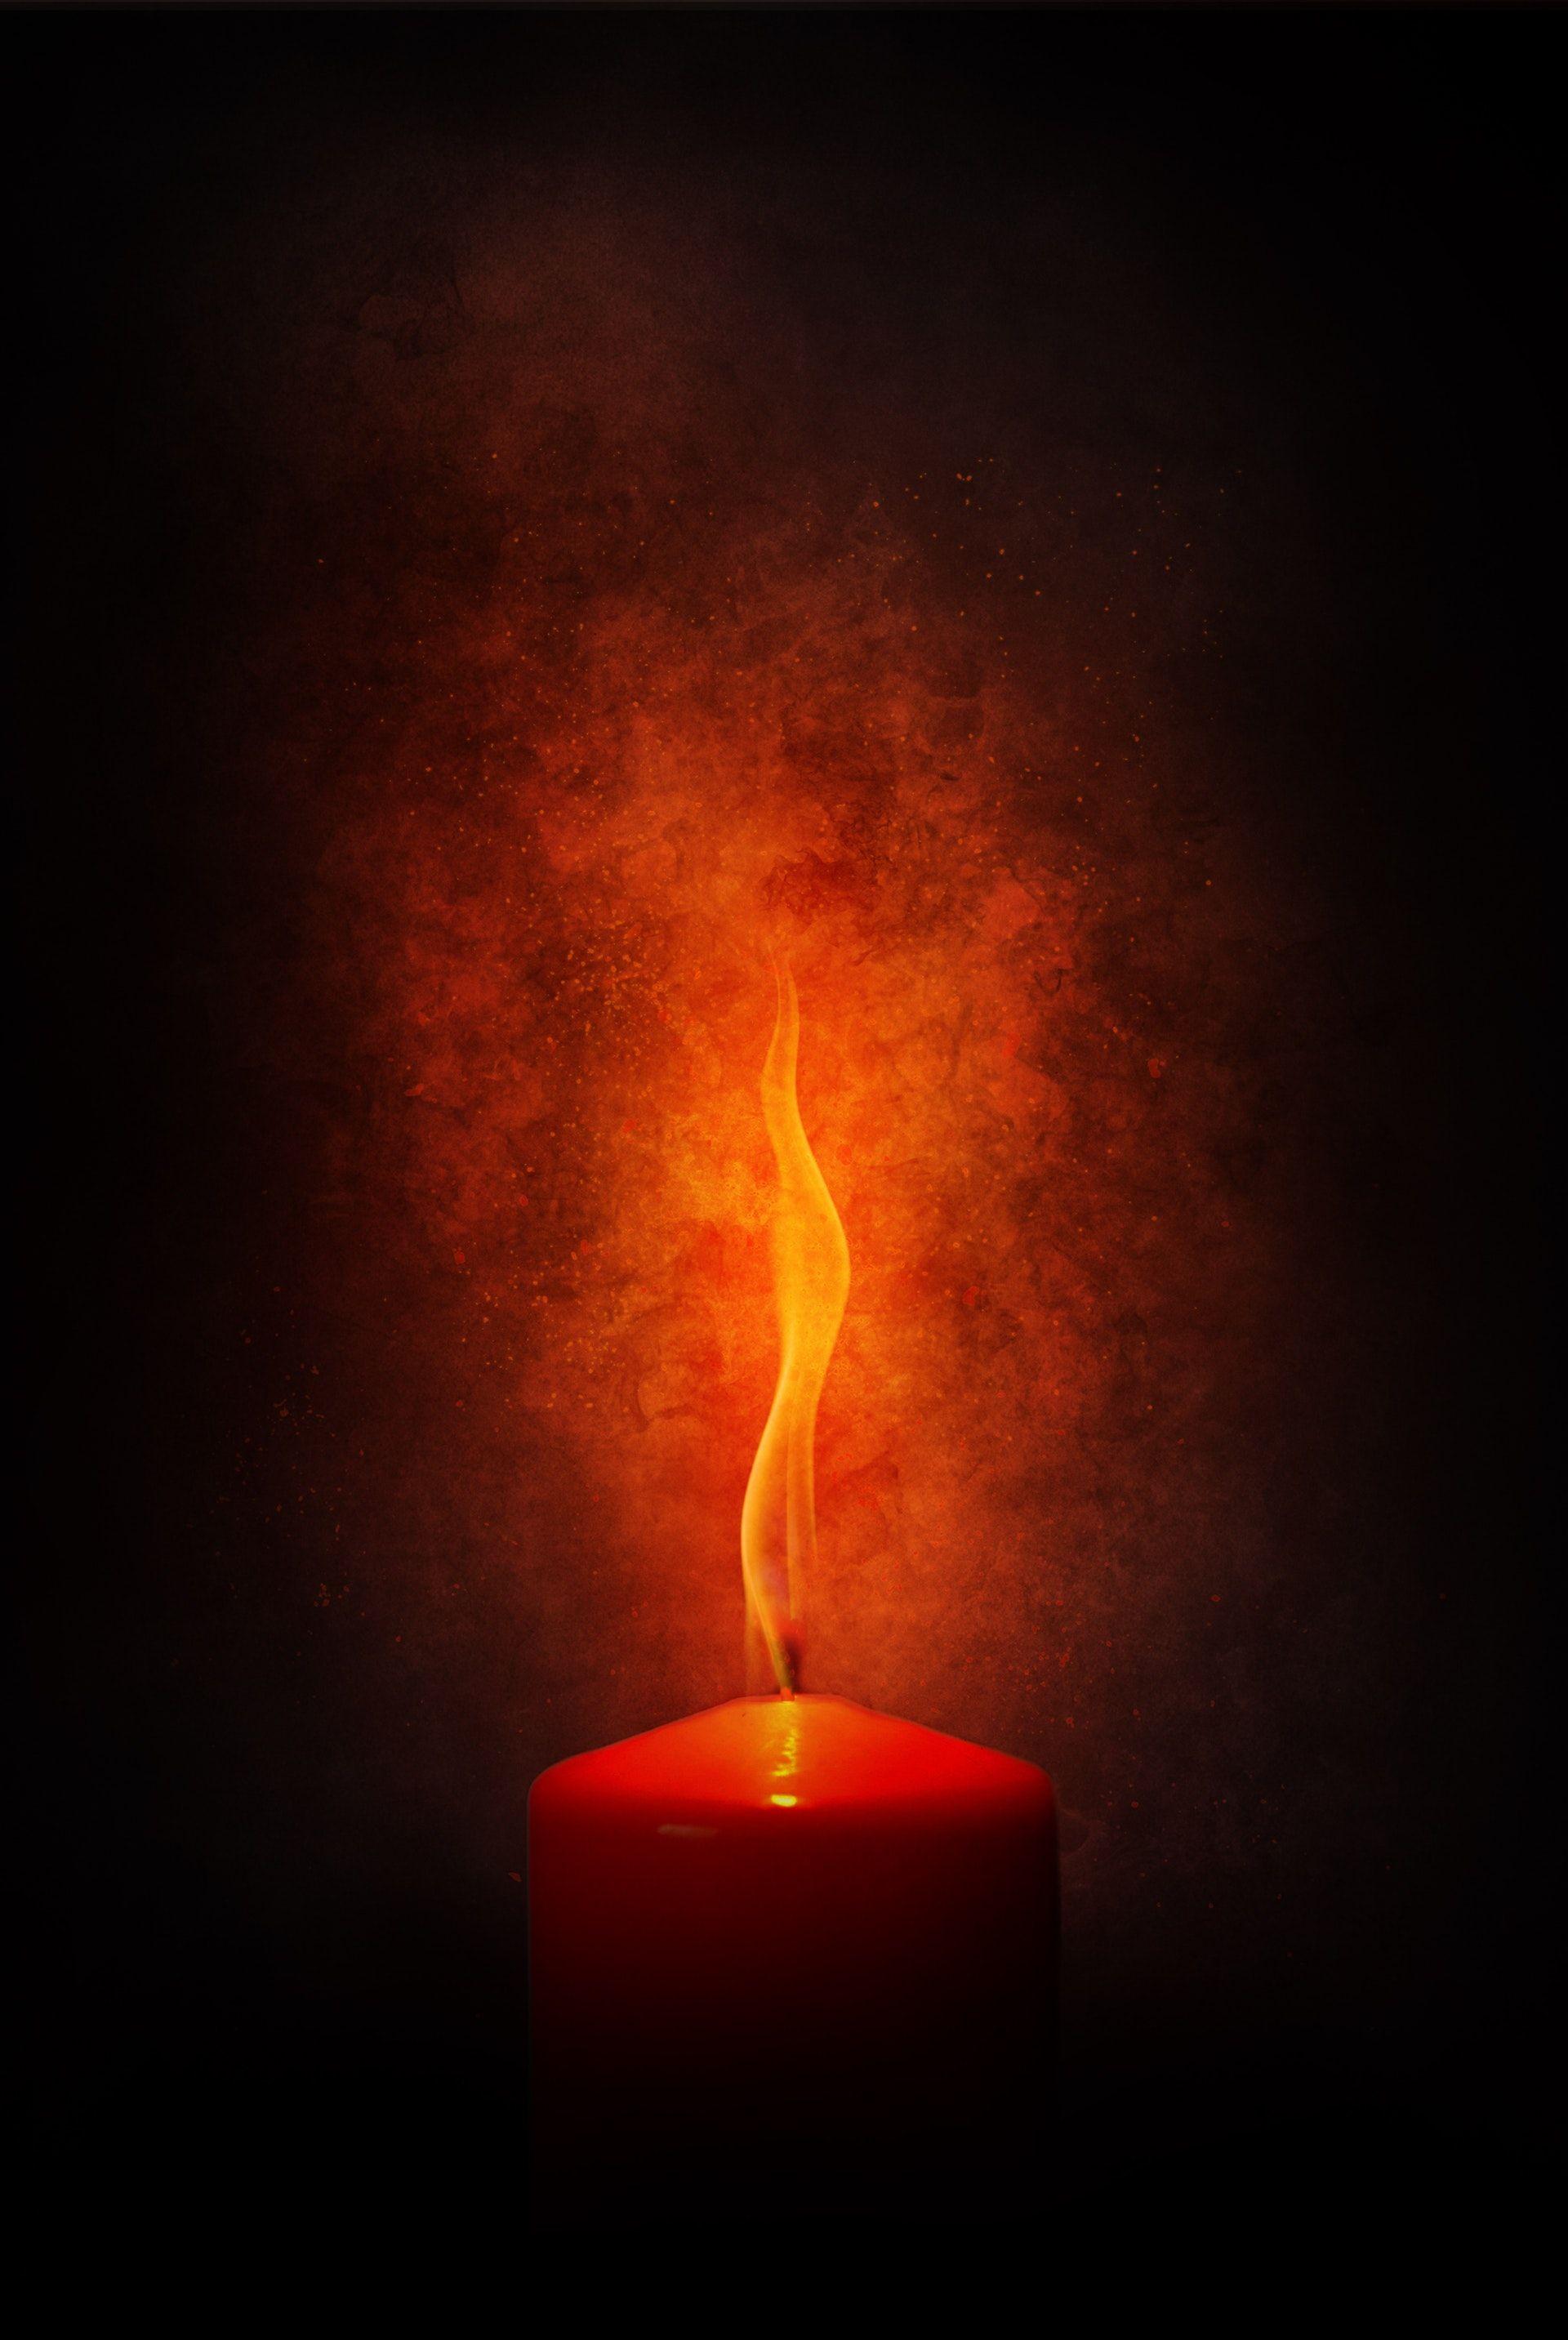 عکس زمینه شمع قرمز پس زمینه